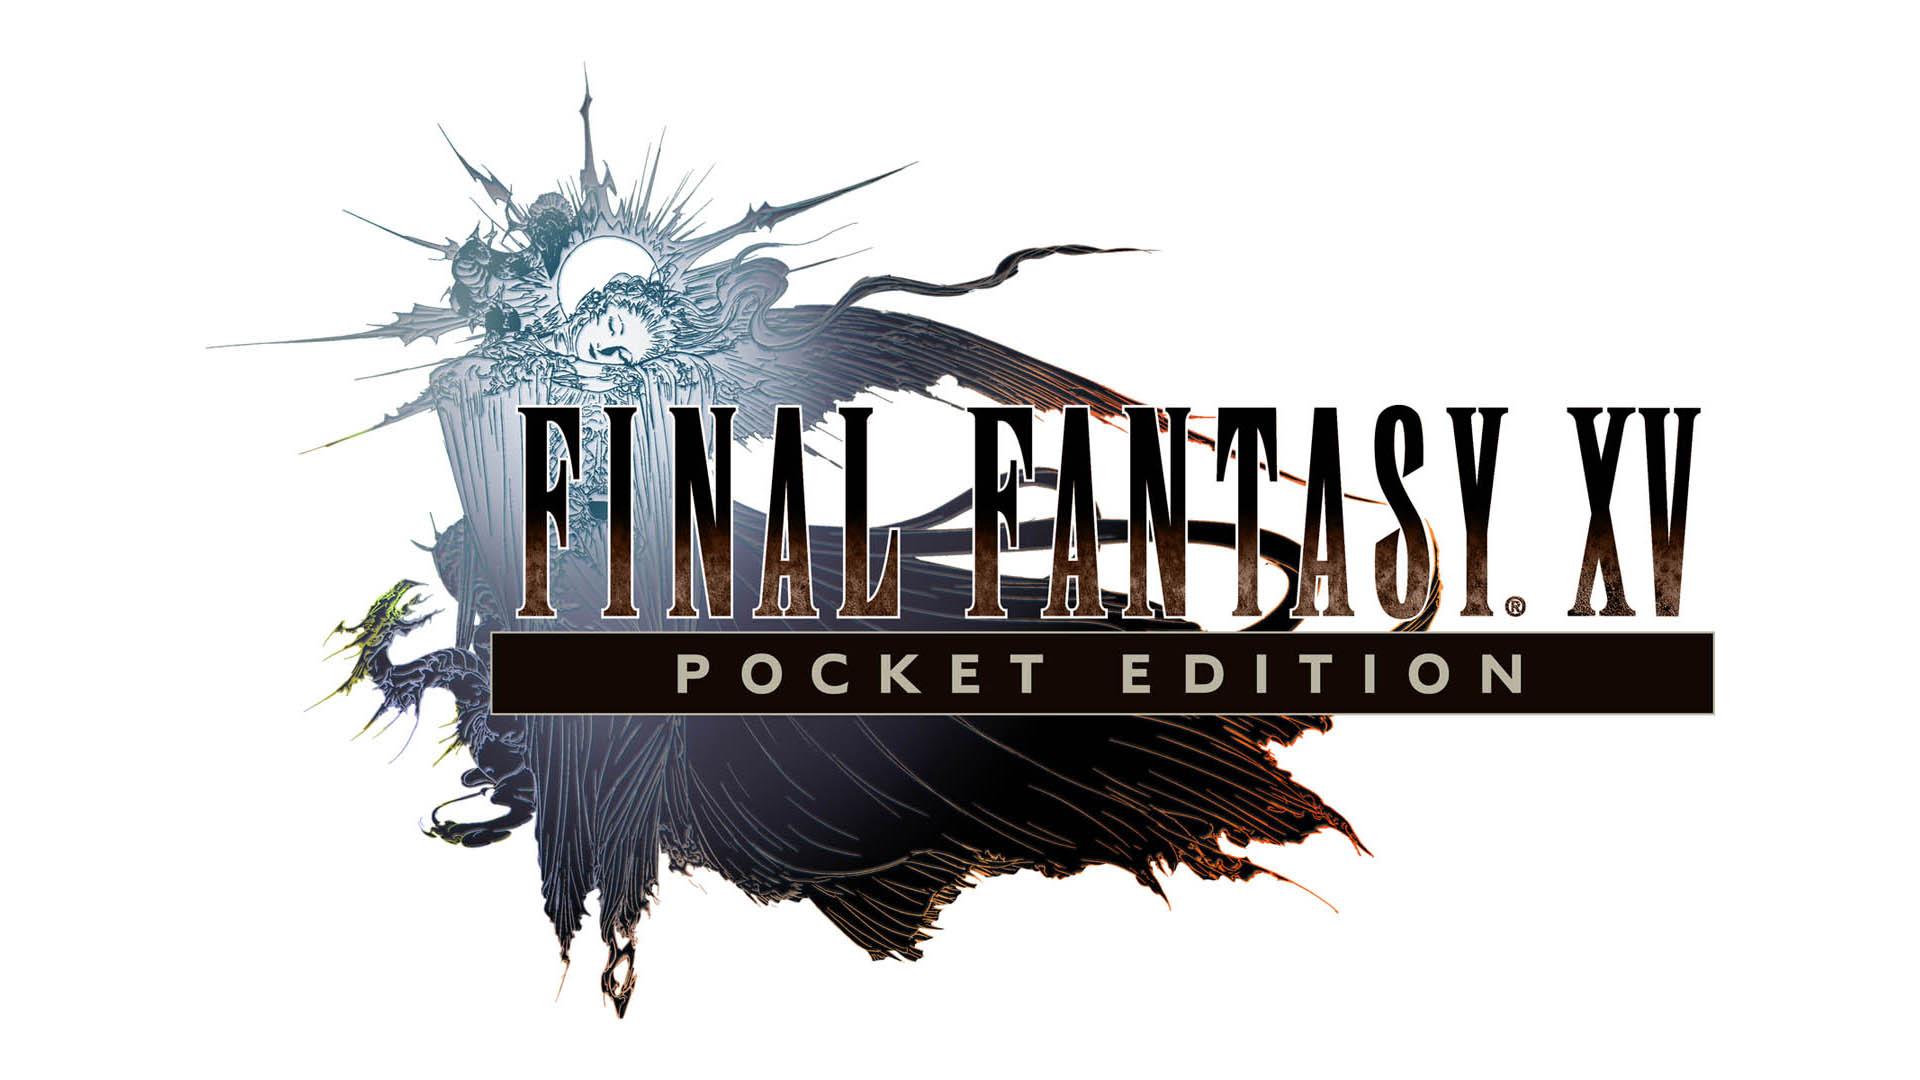 final fantasy xv ffxv 15 pocket edition